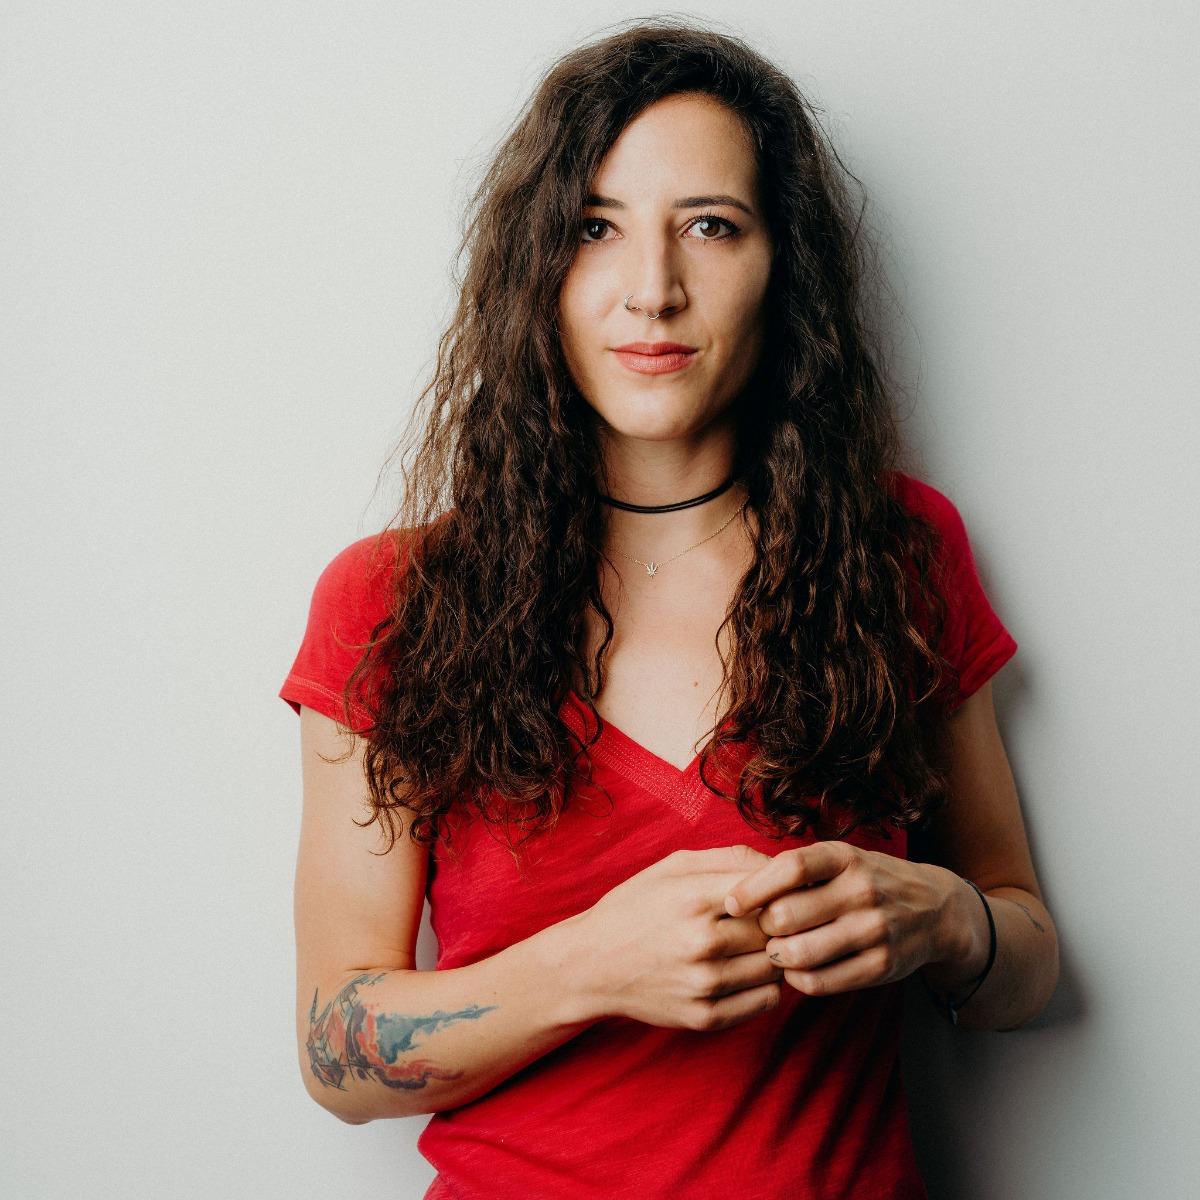 Sarah Zürcher